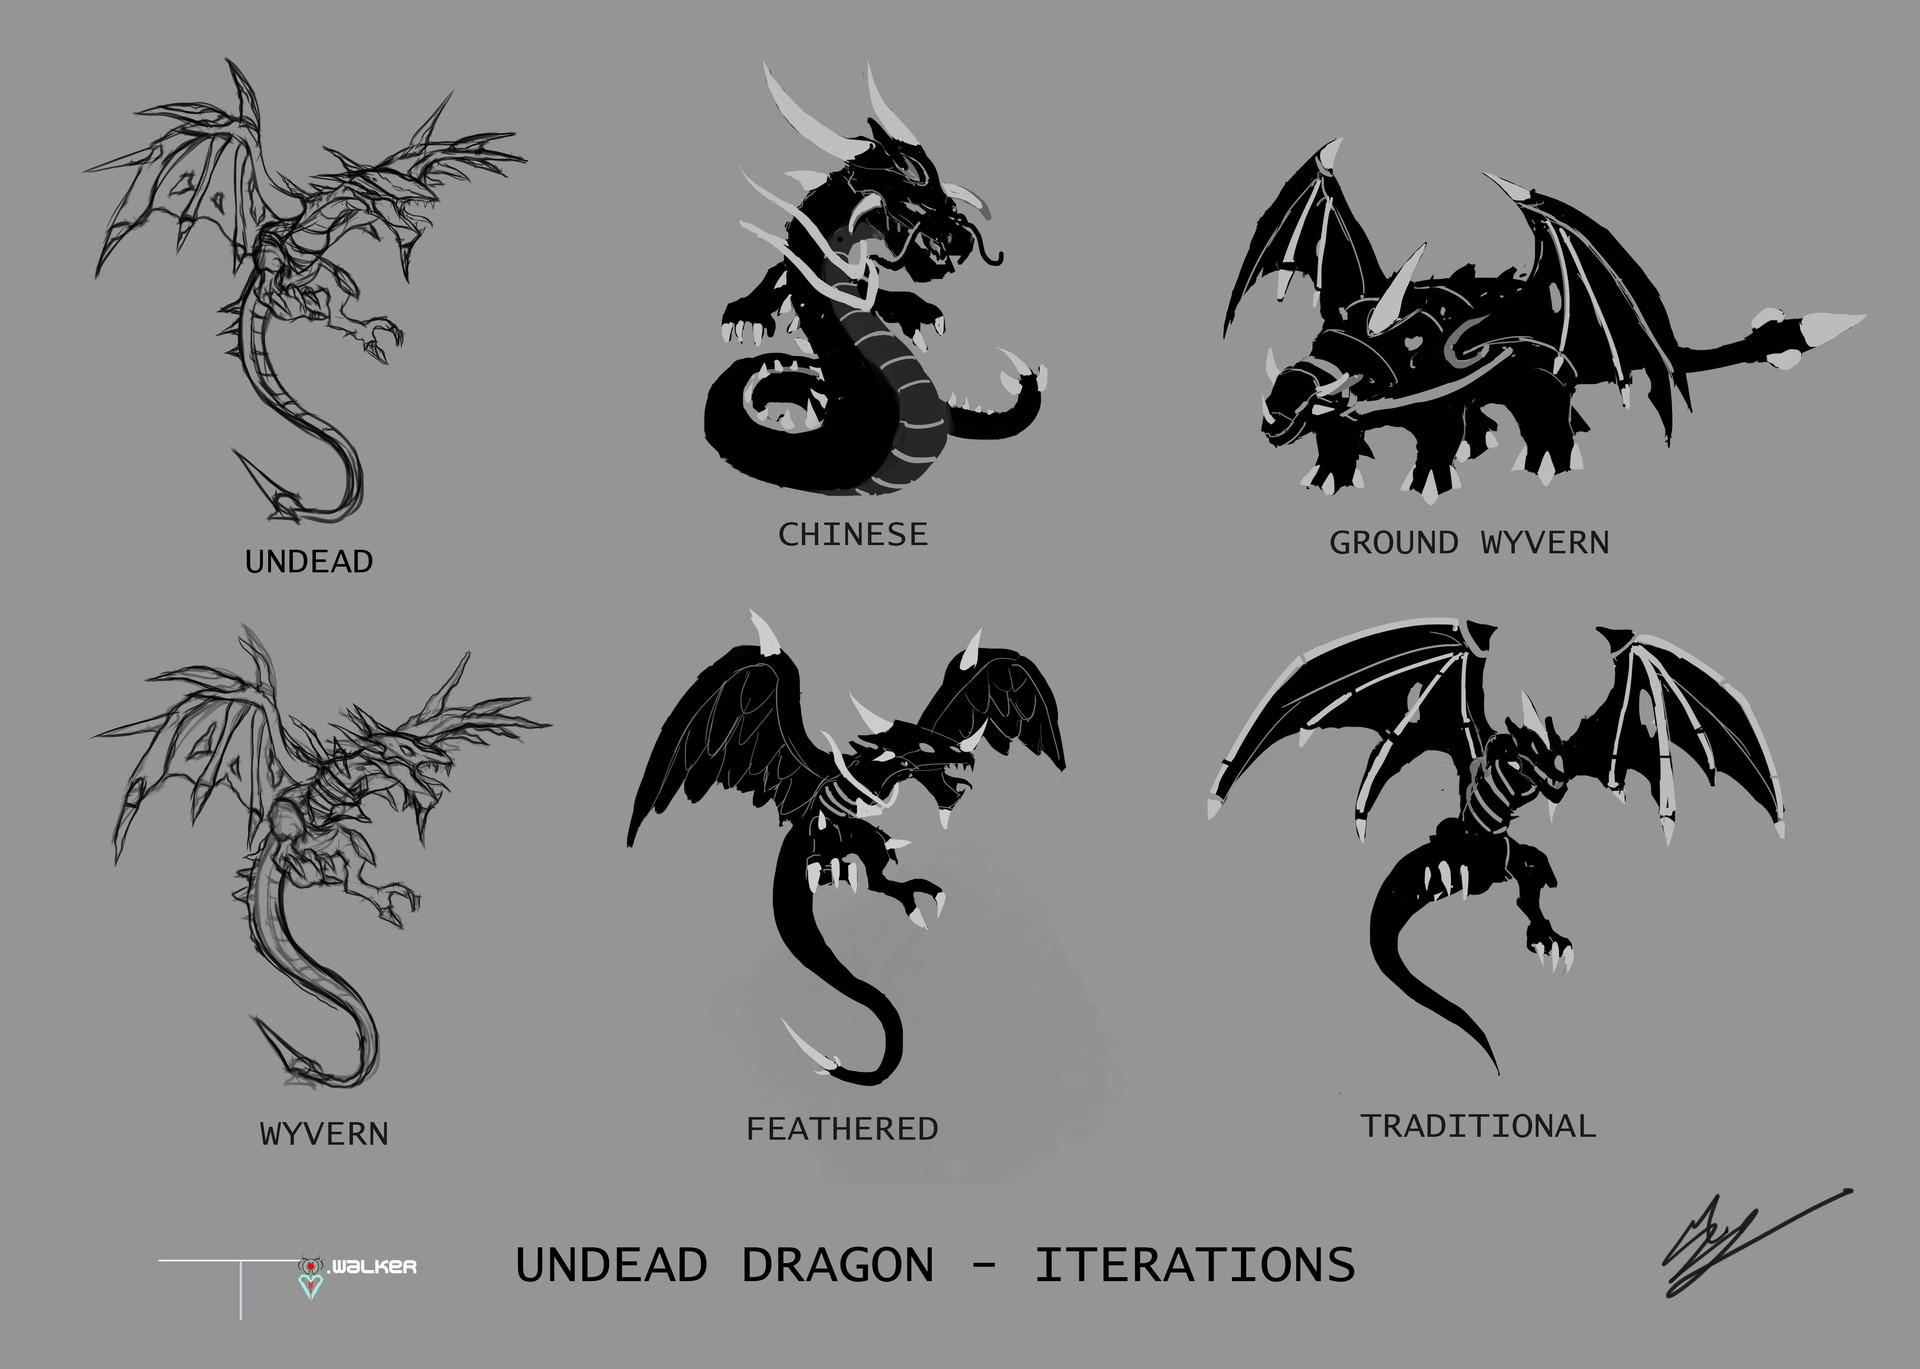 Temarius walker temarius walker war dragons thumbnails sketches undex 01